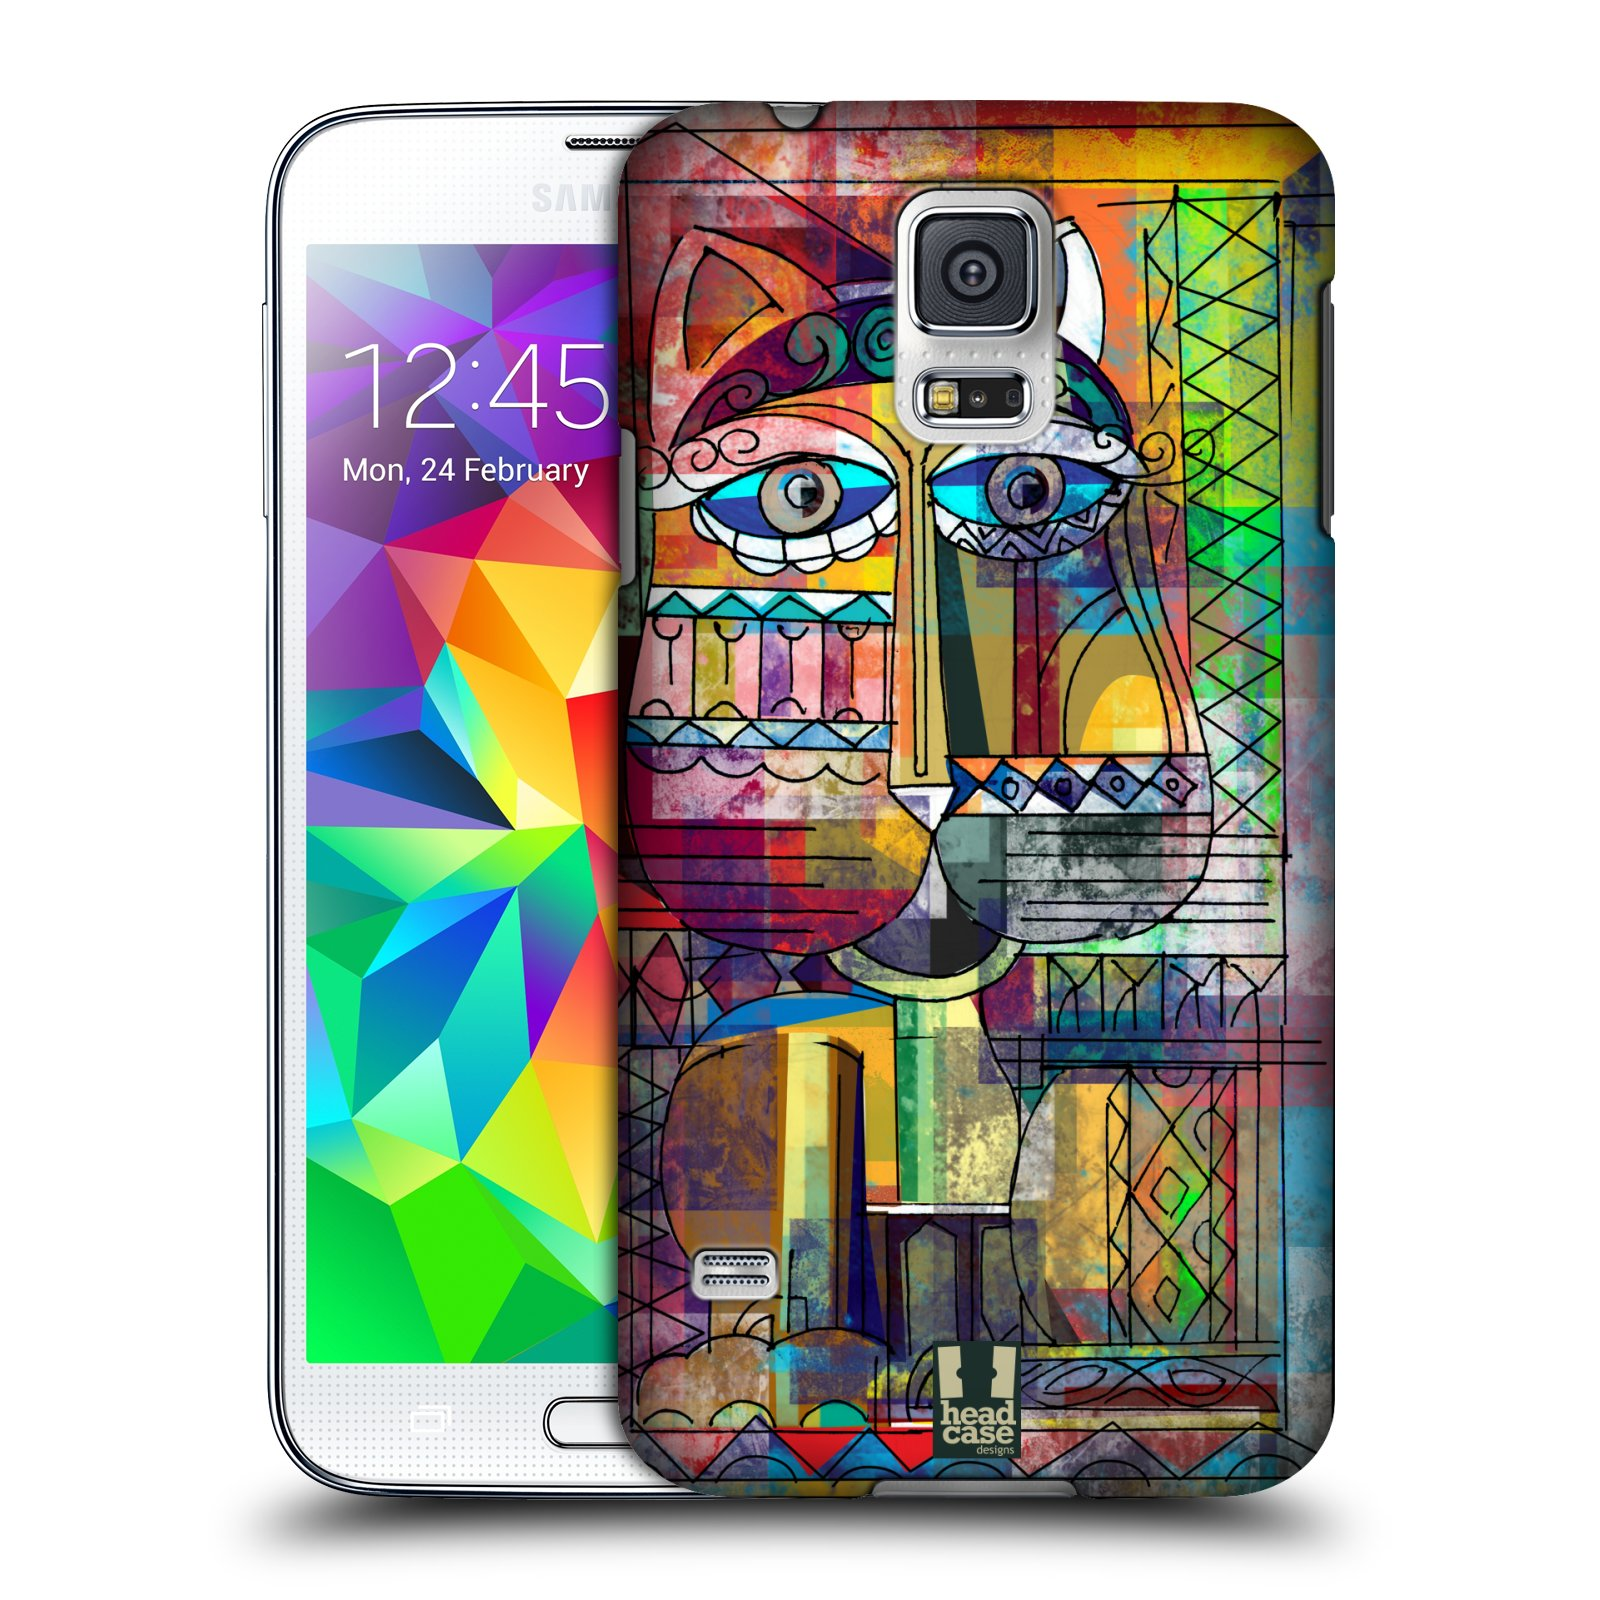 Plastové pouzdro na mobil Samsung Galaxy S5 HEAD CASE AZTEC KORAT